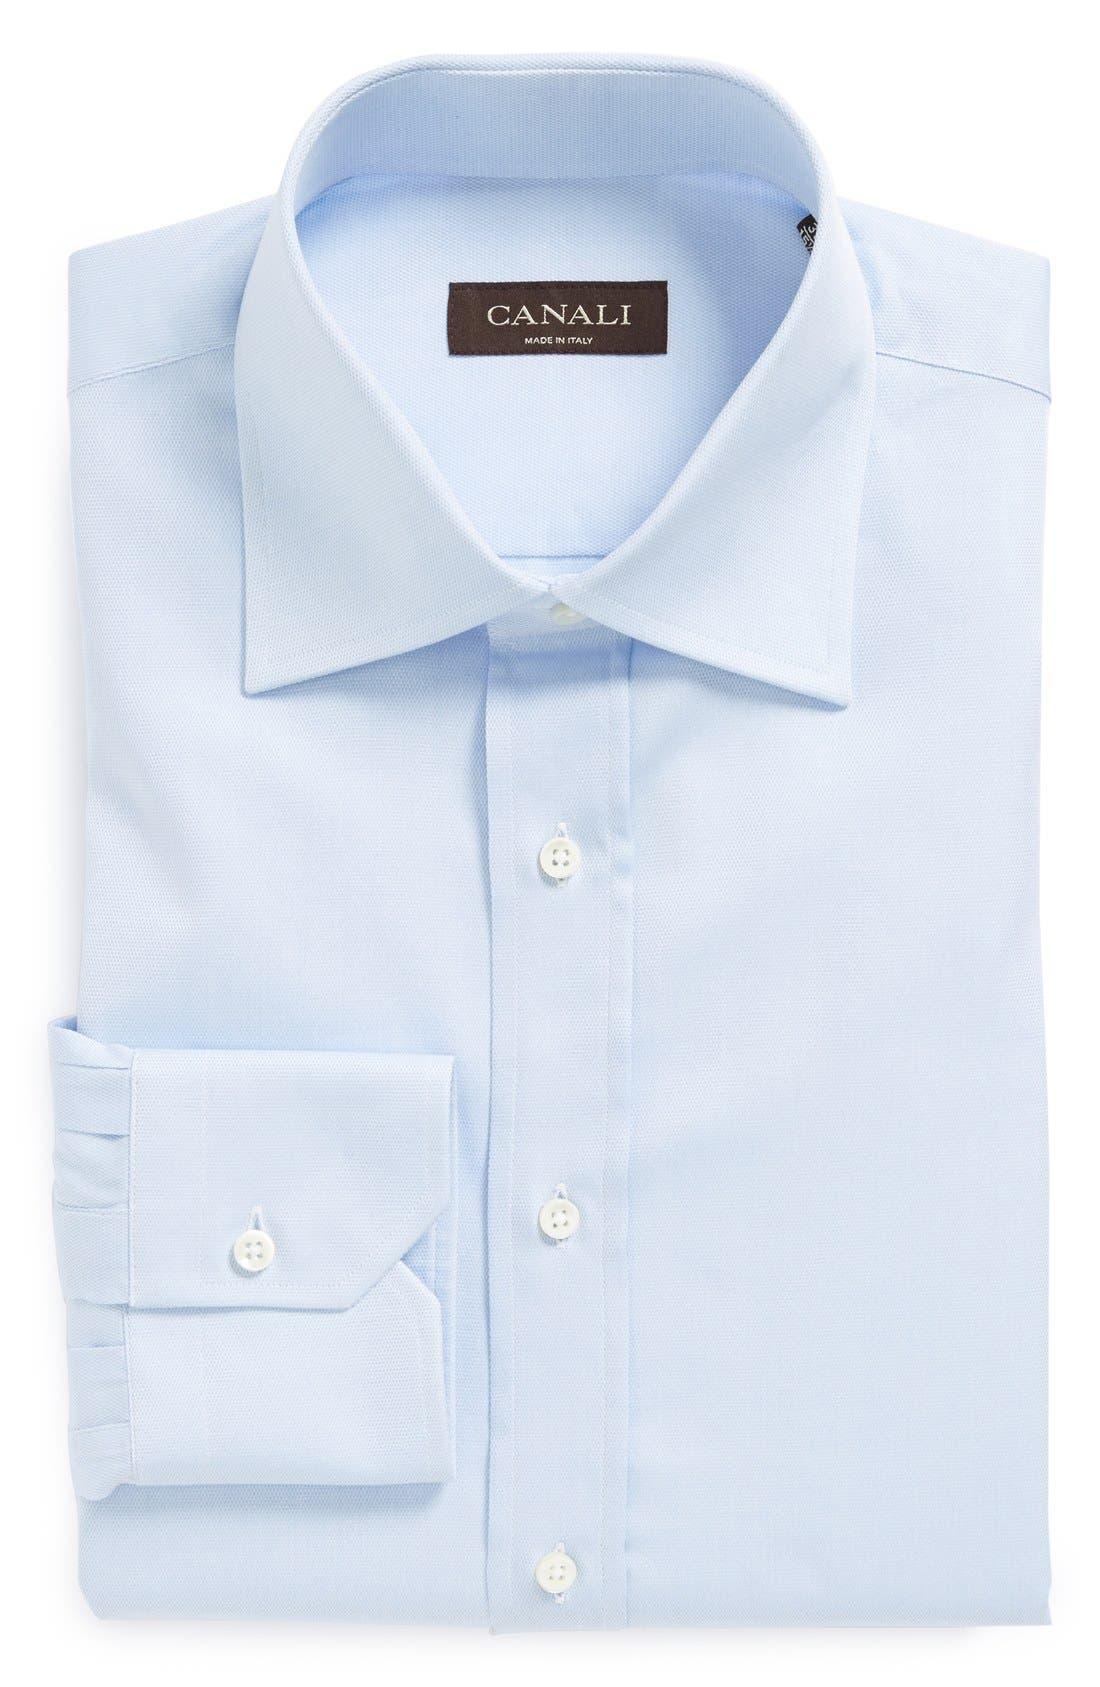 Alternate Image 1 Selected - Canali Regular Fit Solid Dress Shirt